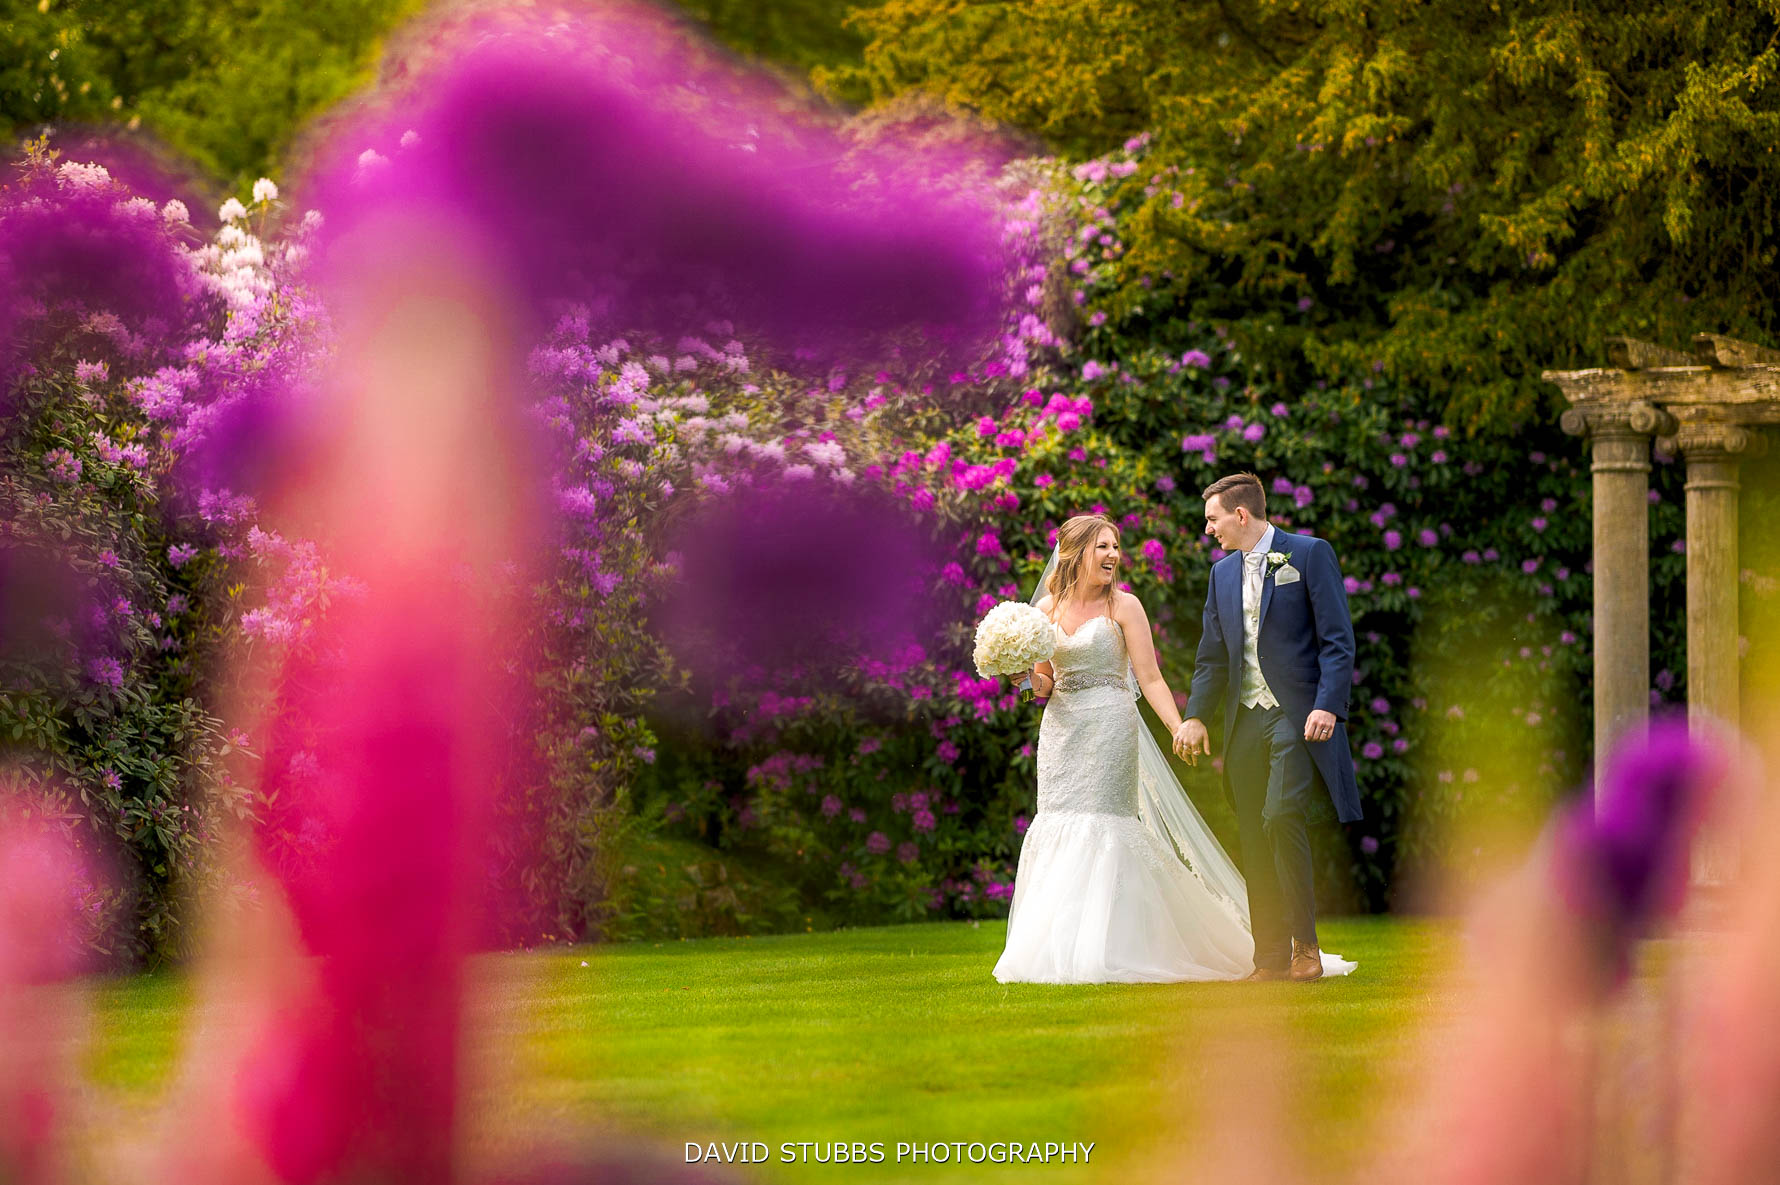 wedding photo in vibrant colour